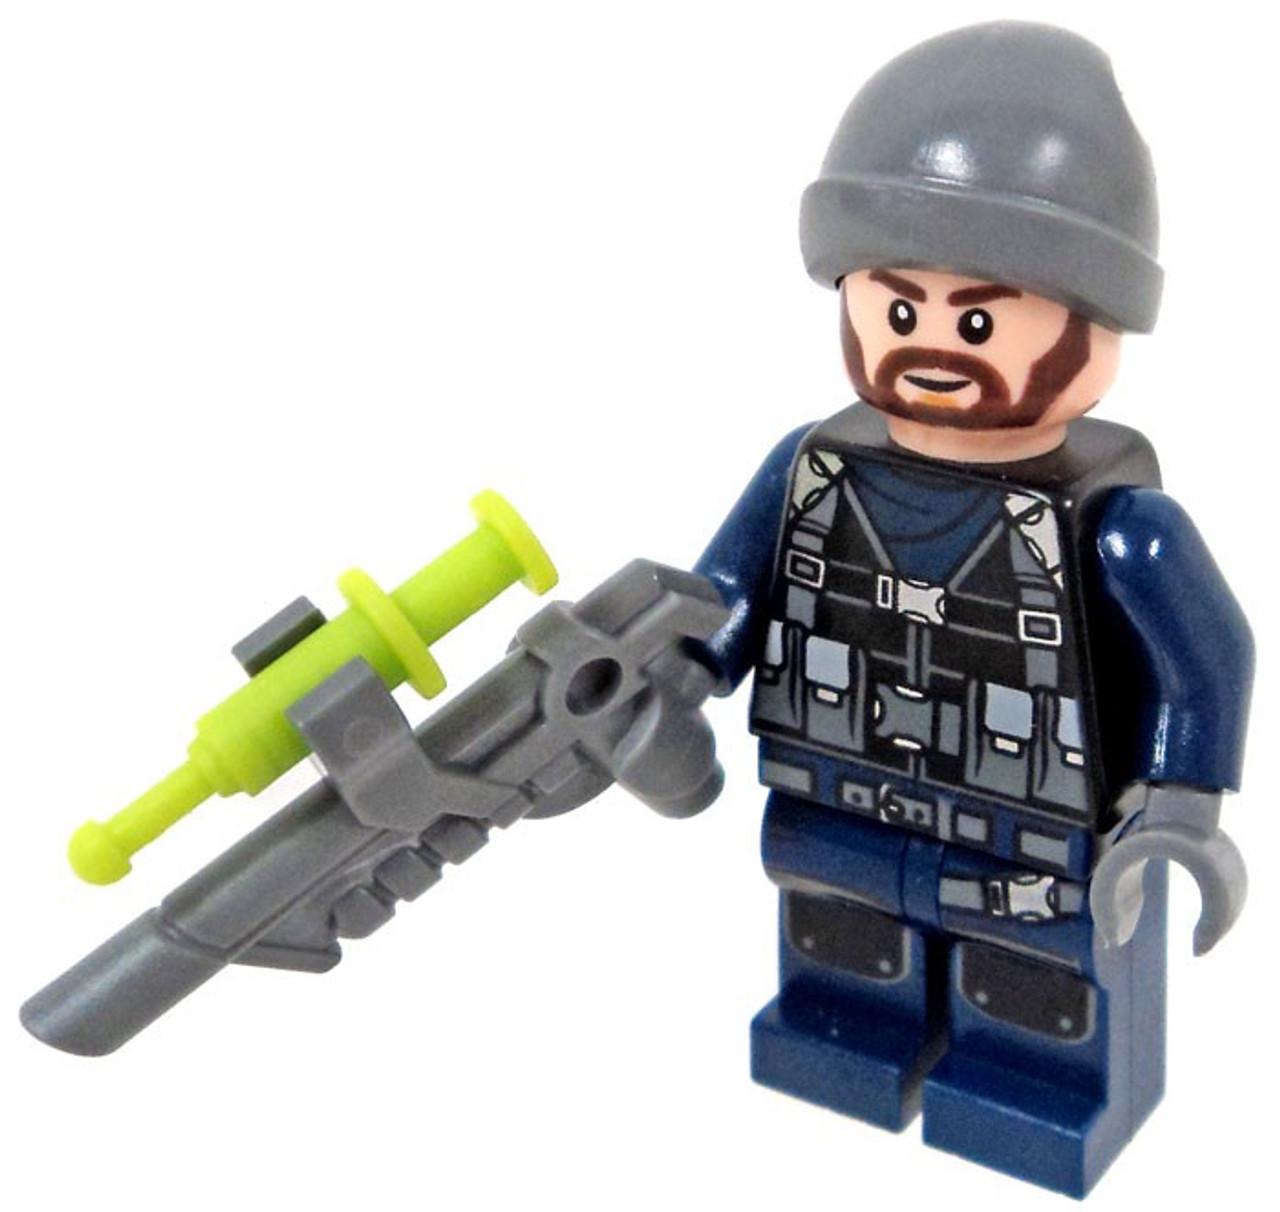 LEGO Jurassic World Fallen Kingdom Guard Minifigure [with Tranquilizer Gun  Loose]